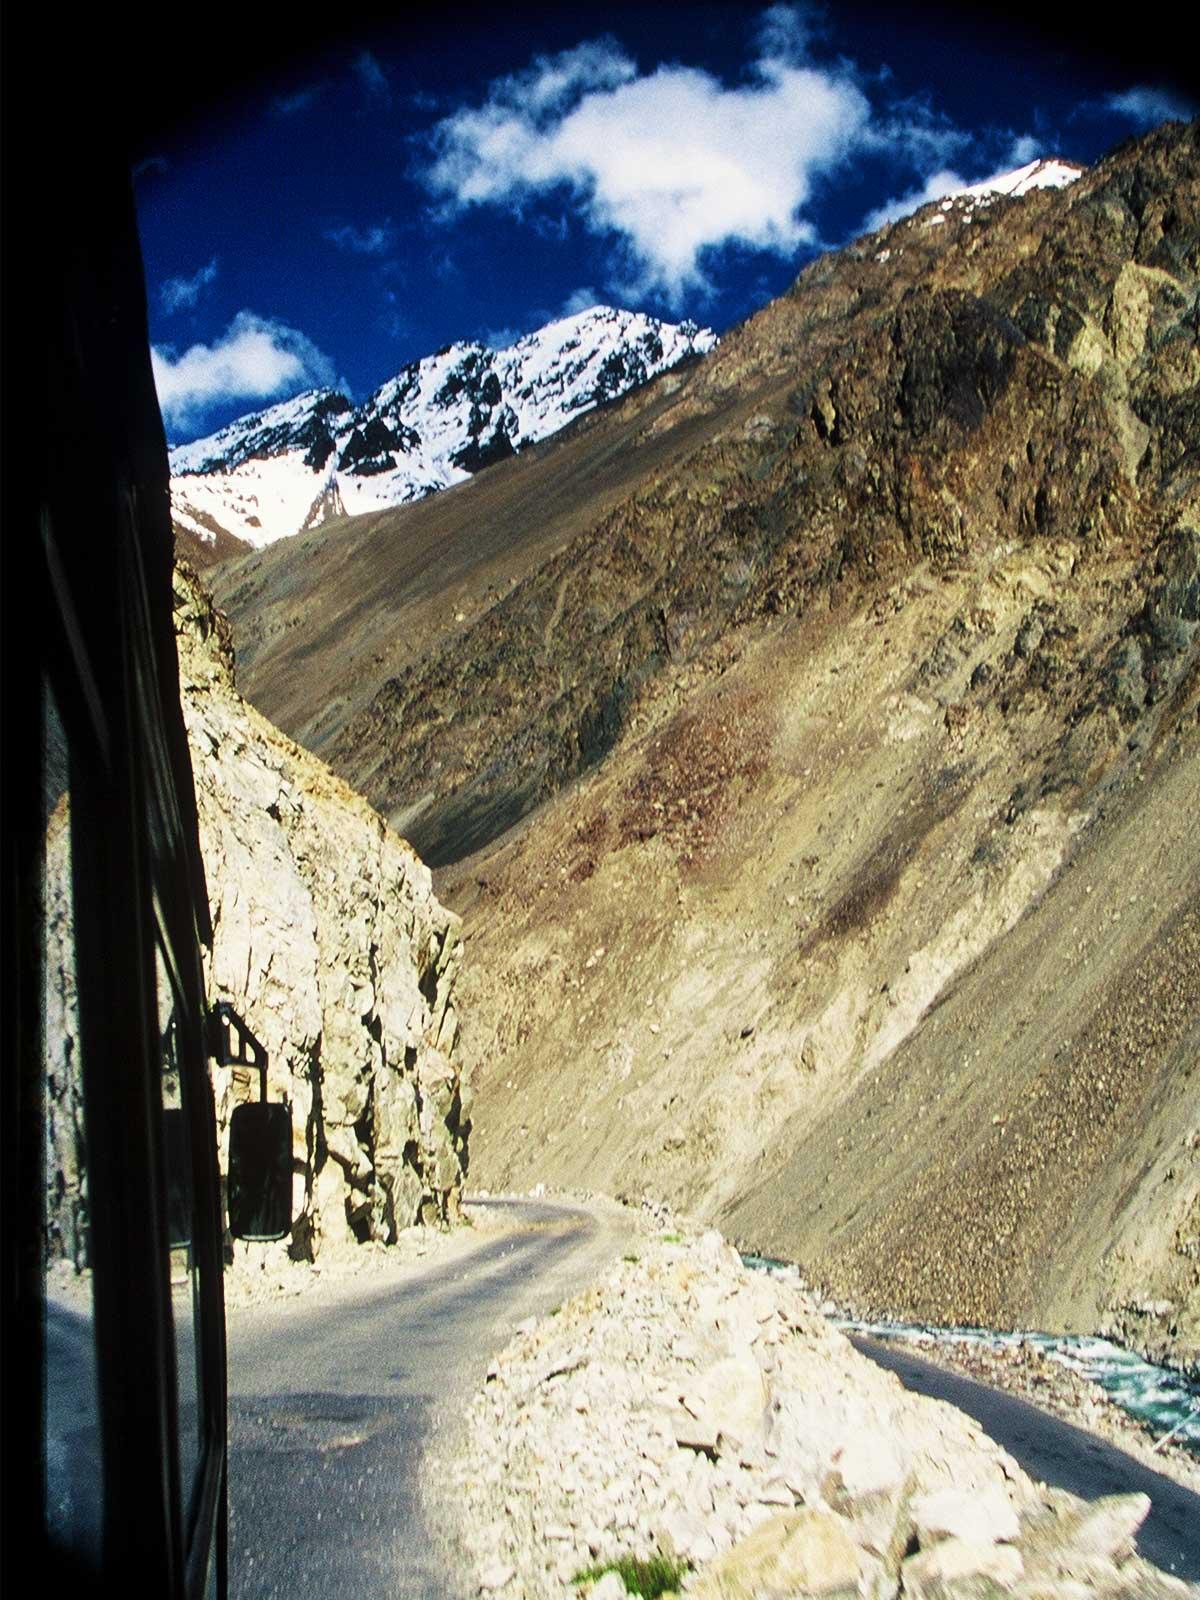 Karakoram Highway | Pakistan China Border Area | Public Bus | Steven A Martin | Education Abroad